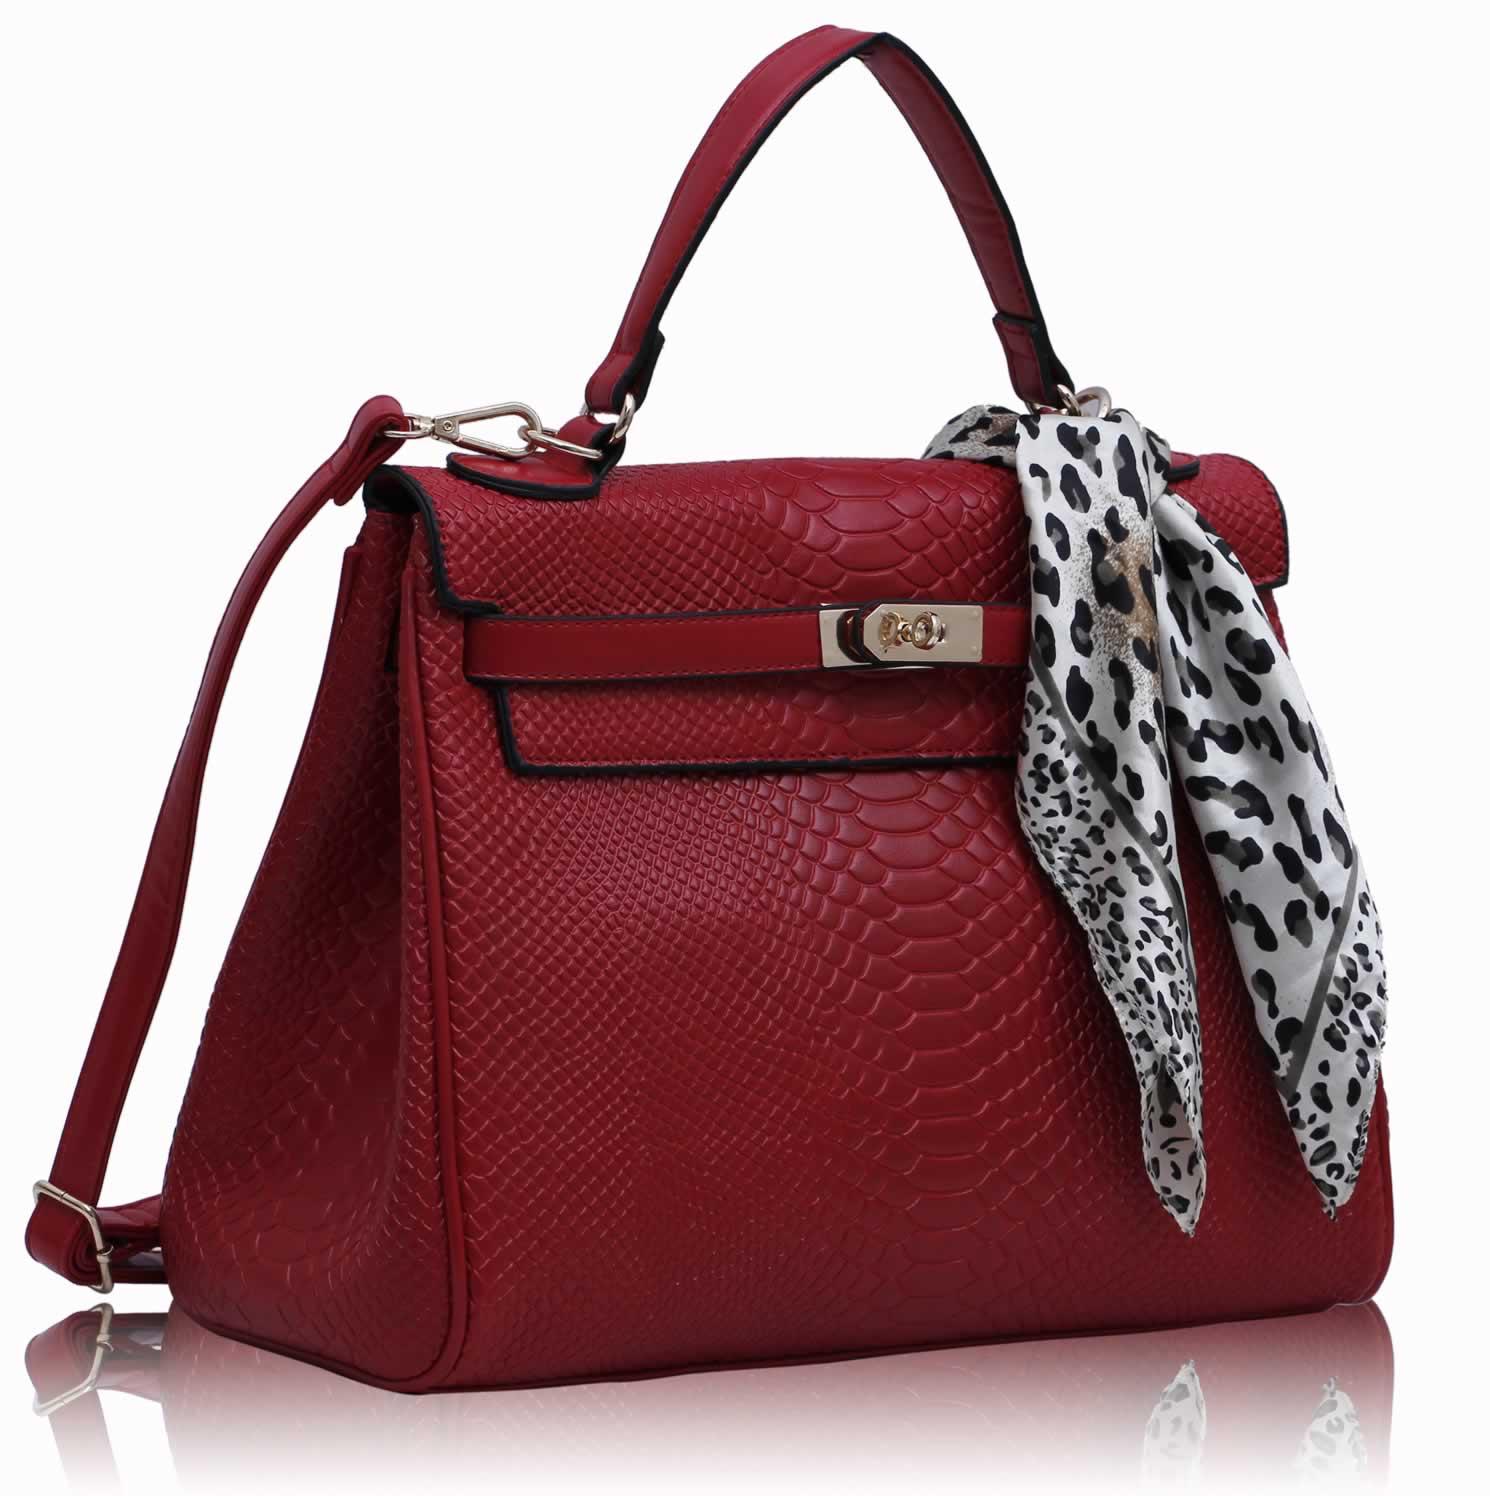 95daa4700334 Kabelka LS Fashion LS0057S červená Tote